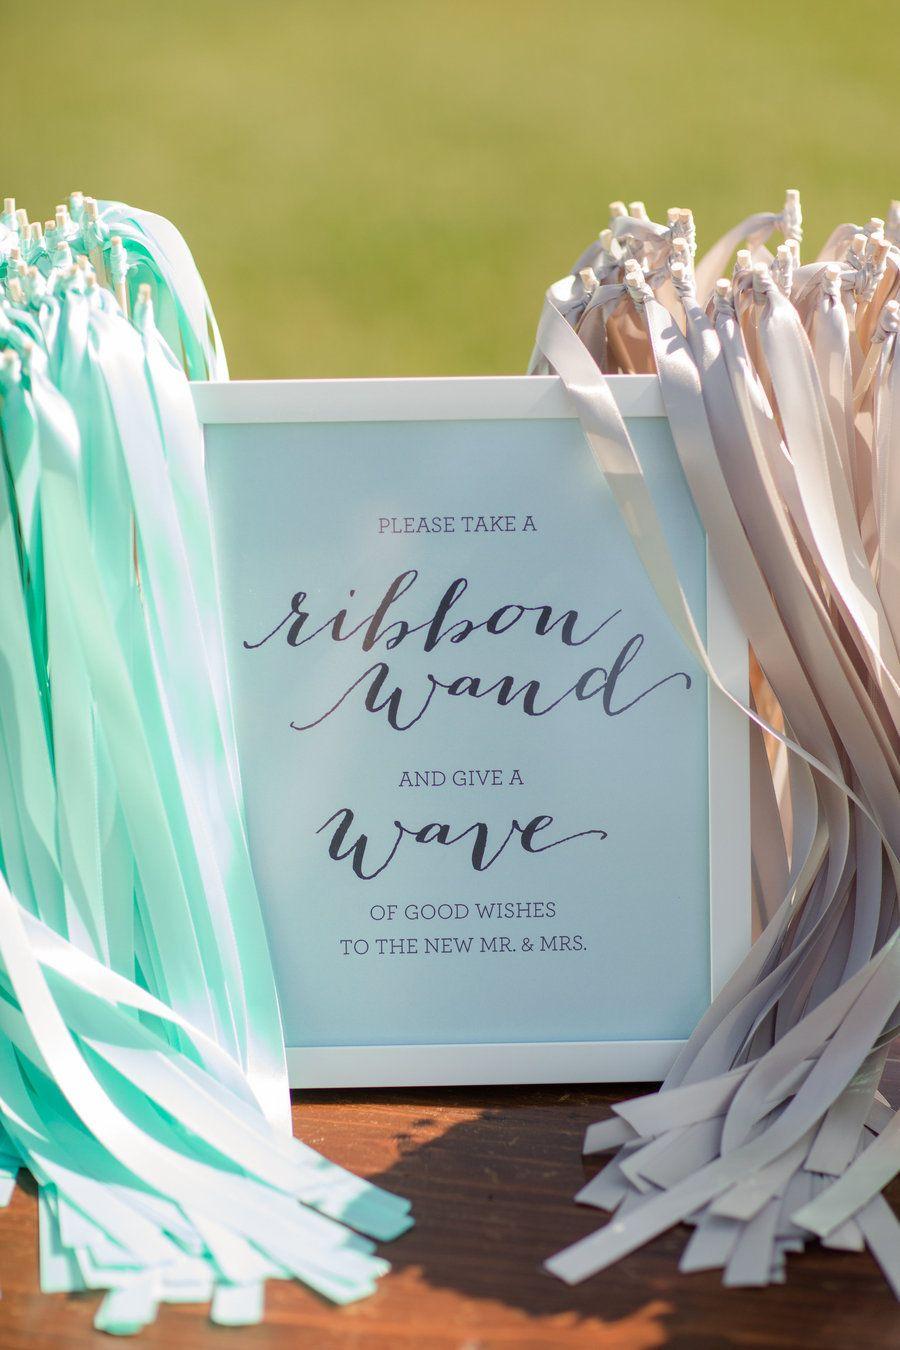 Charlottesville Wedding from Katelyn James Wedding wands